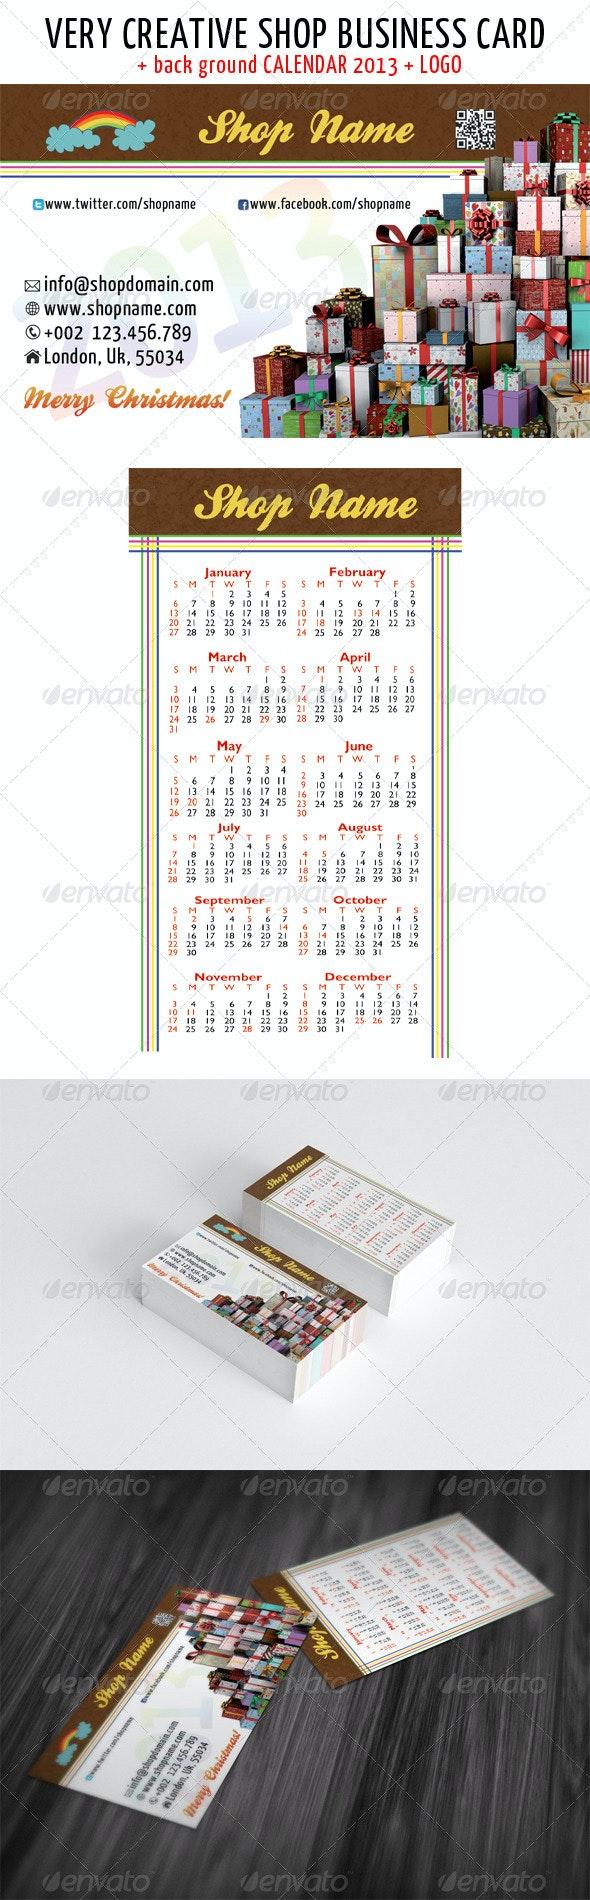 Christmas shop business card - Creative Business Cards